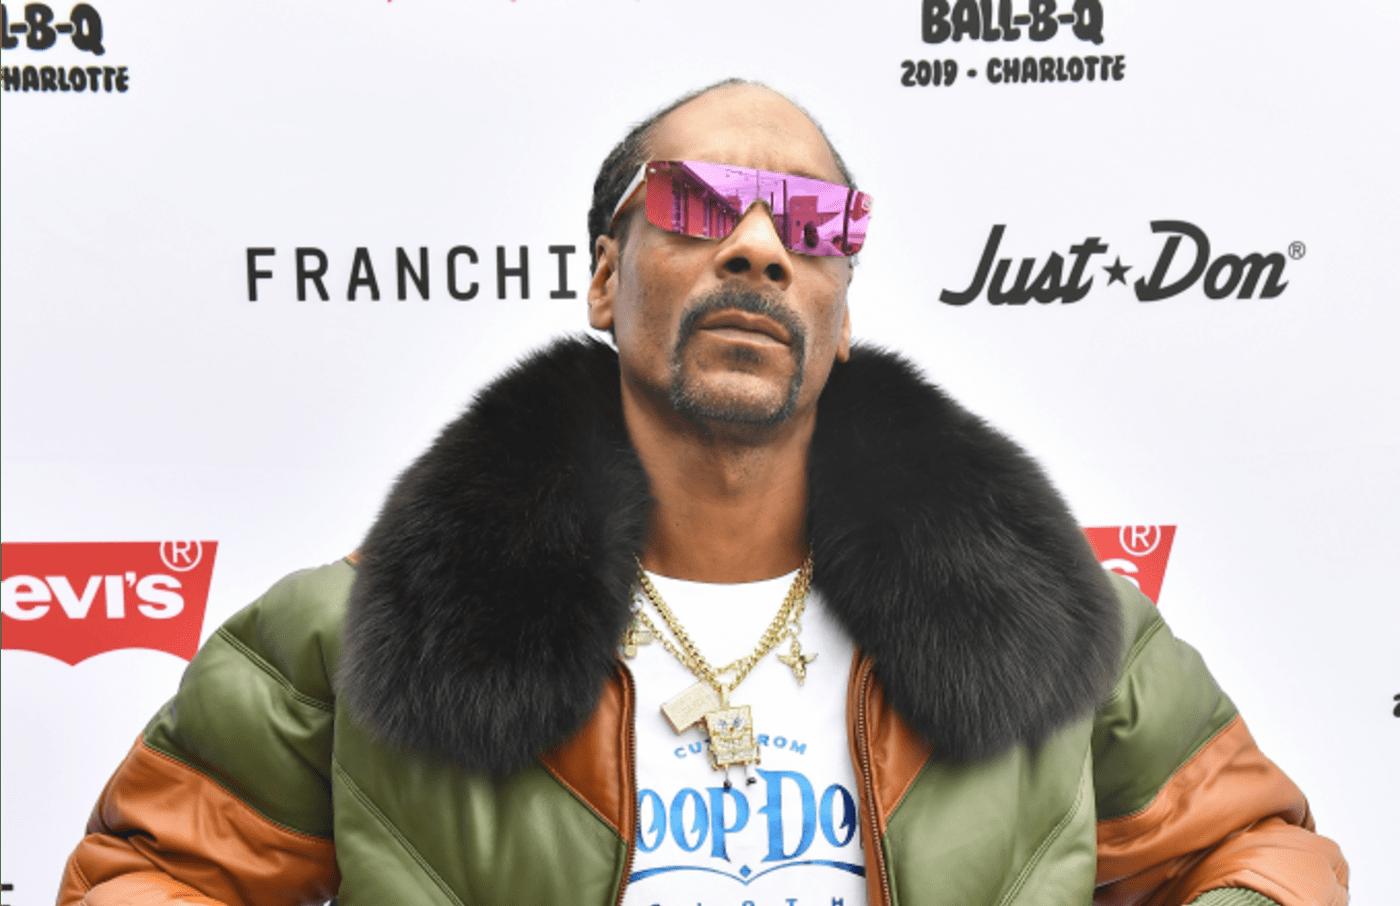 Rapper Snoop Dogg attends Levi's® All Star Weekend Ball B Q